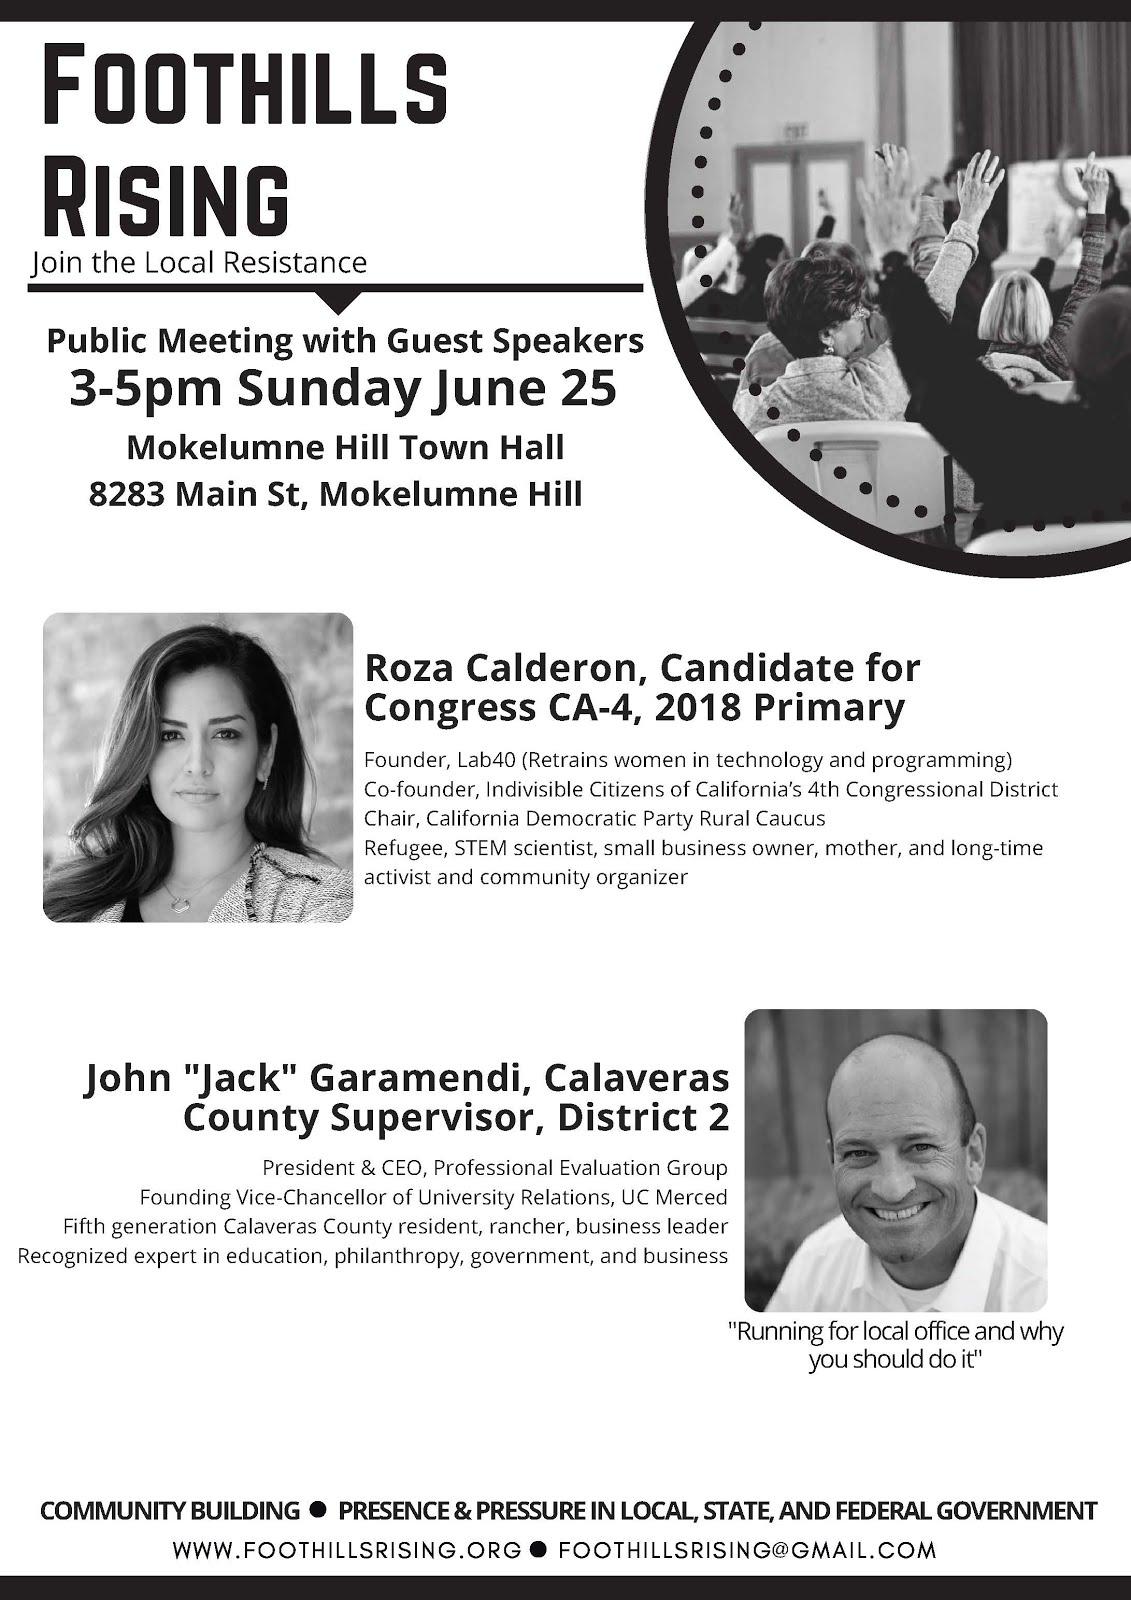 Foothills Rising Meeting - Sun June 25